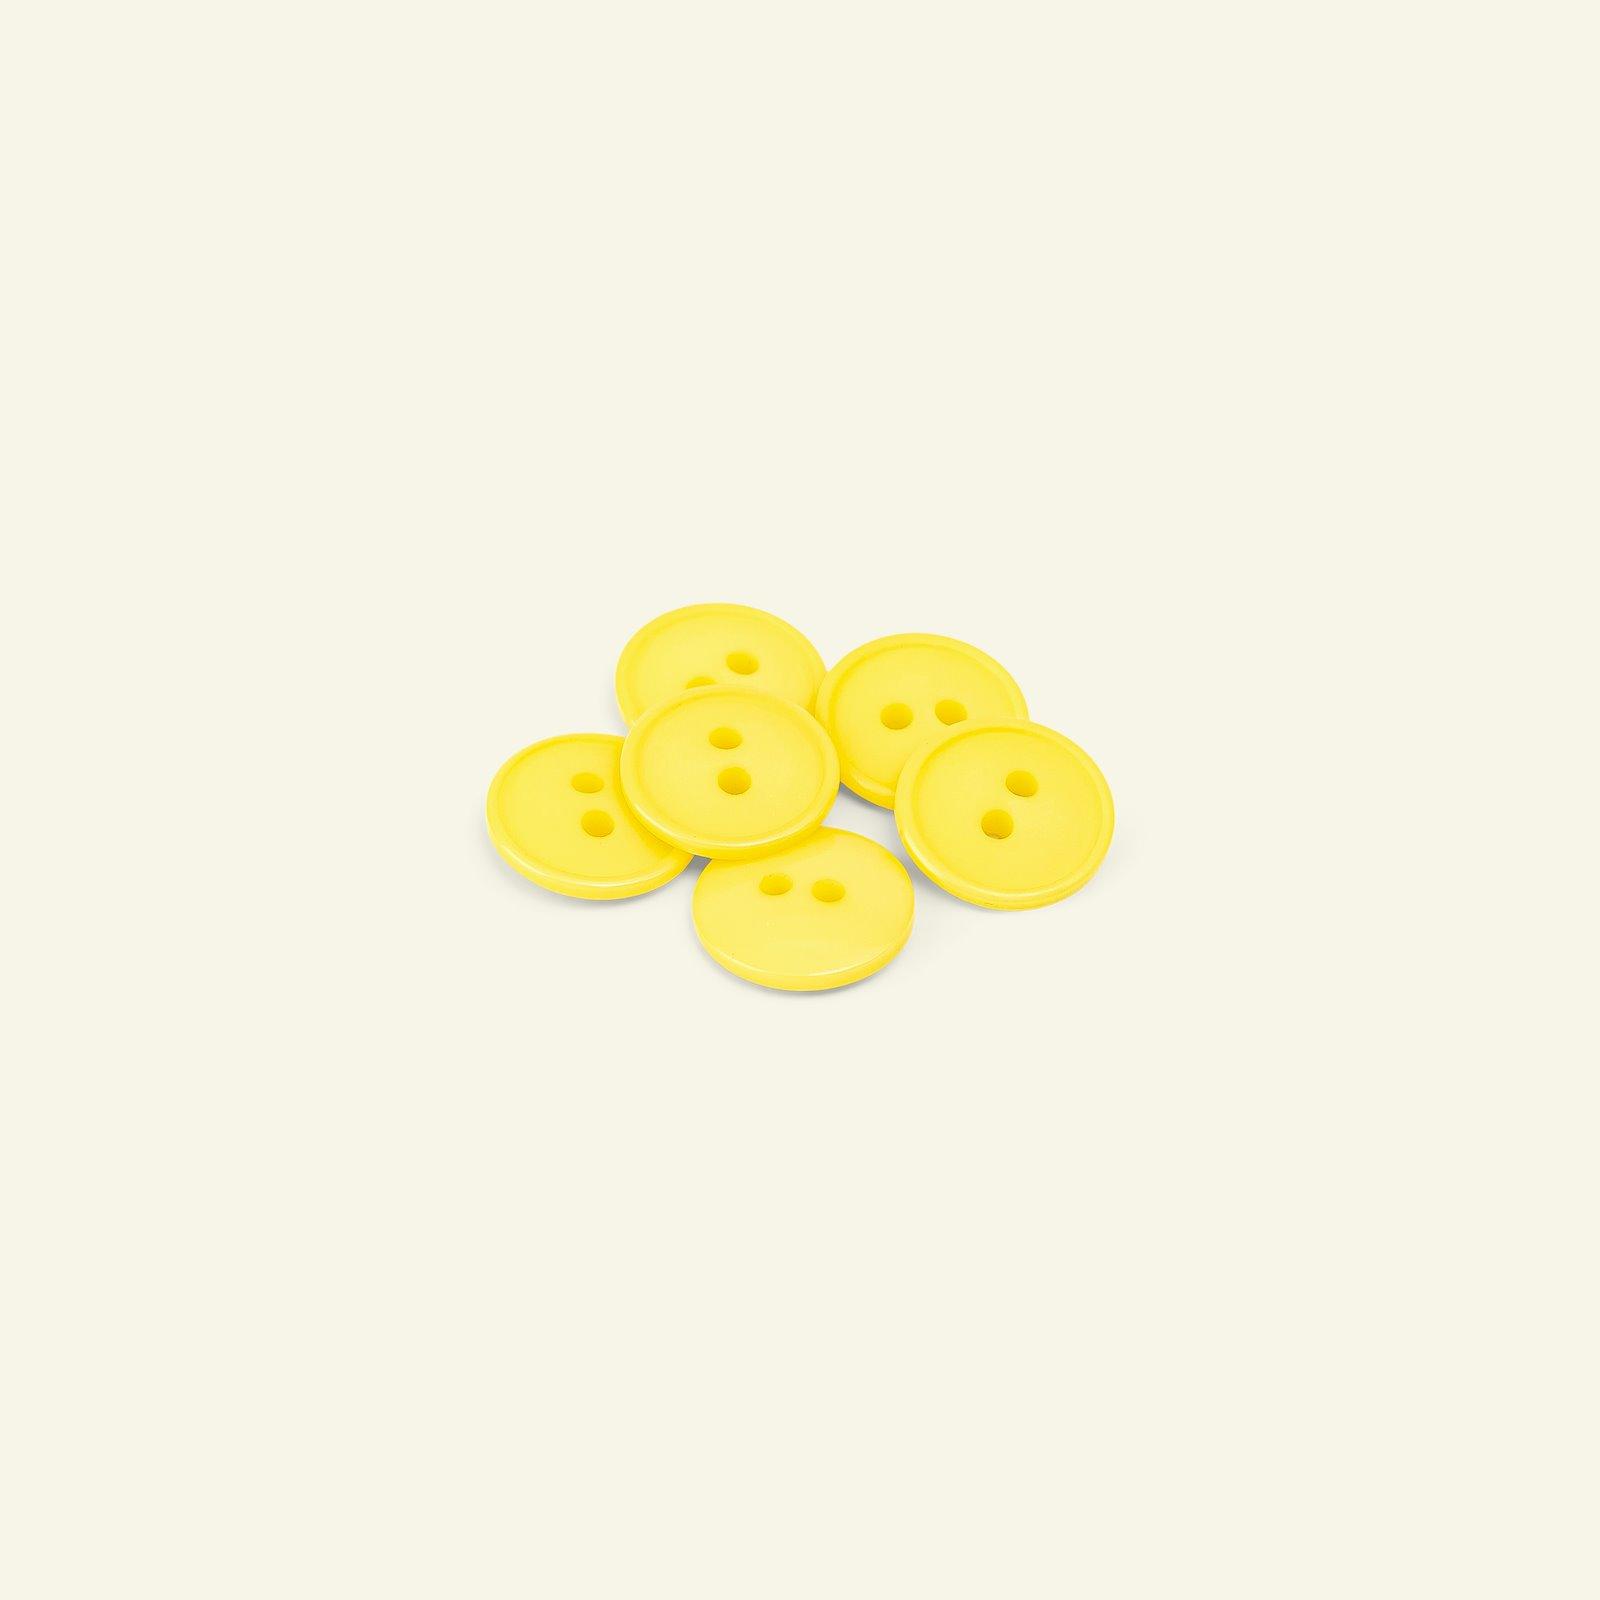 Button 2-holes w/rim 15mm yellow 6pcs 33262_pack